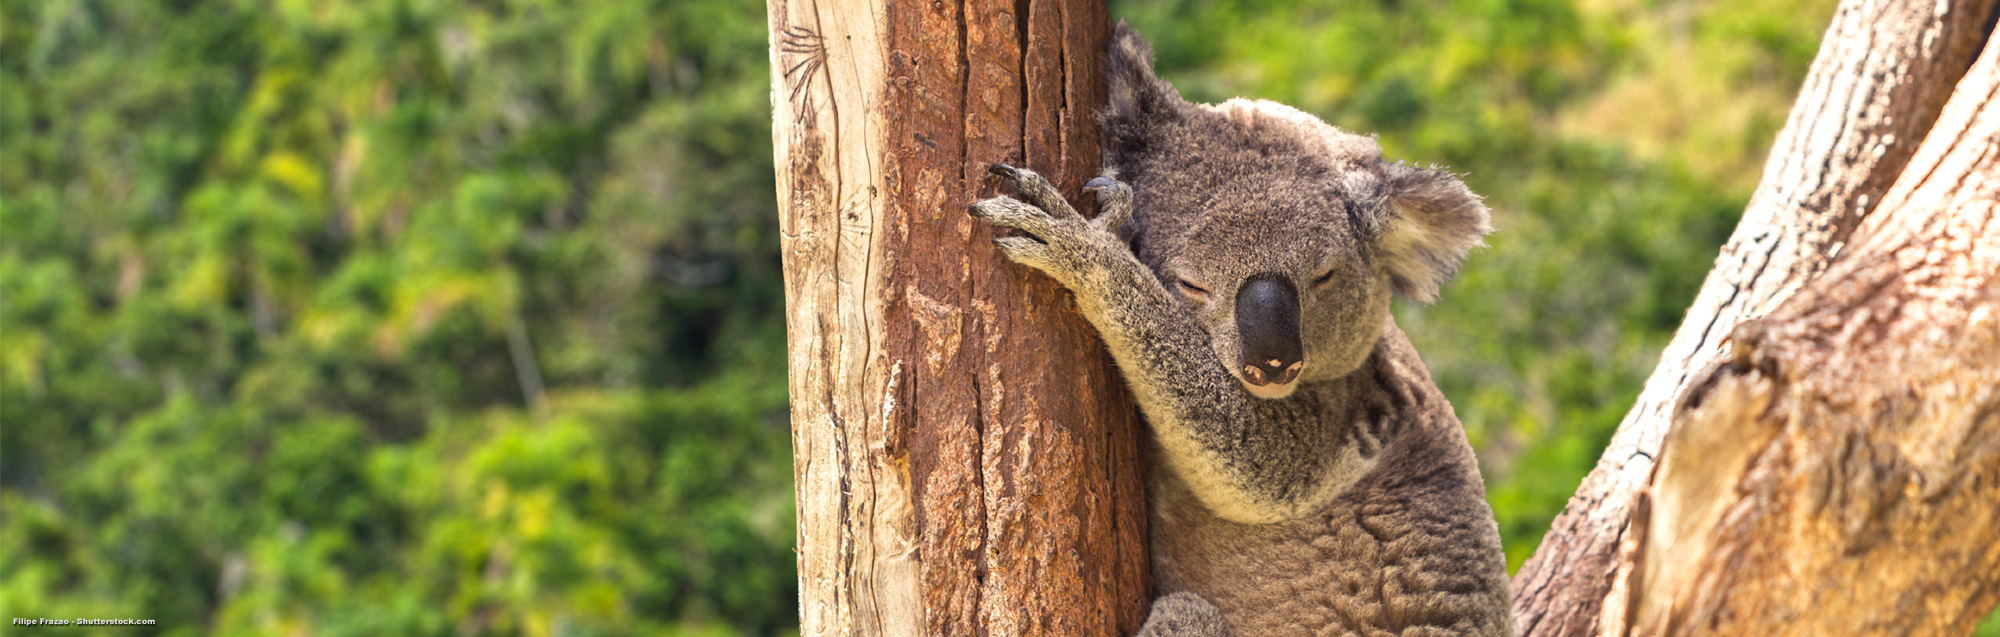 Pasos para obtener tu visa para estudiar en Australia